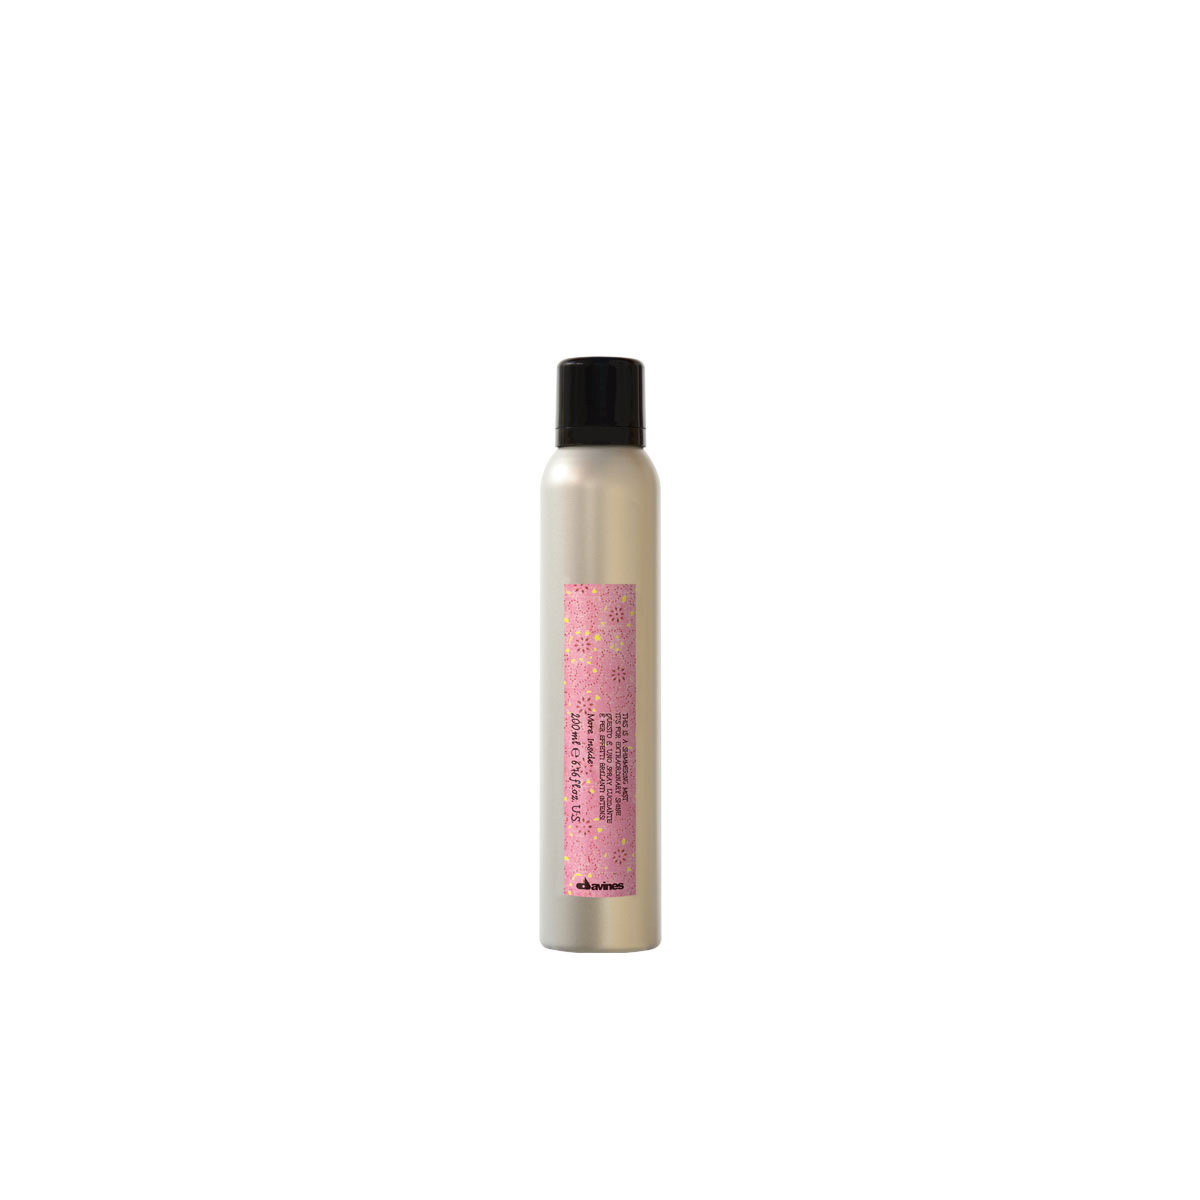 Davines This is a Shimmering Mist 200 ml   Spray de Brillo